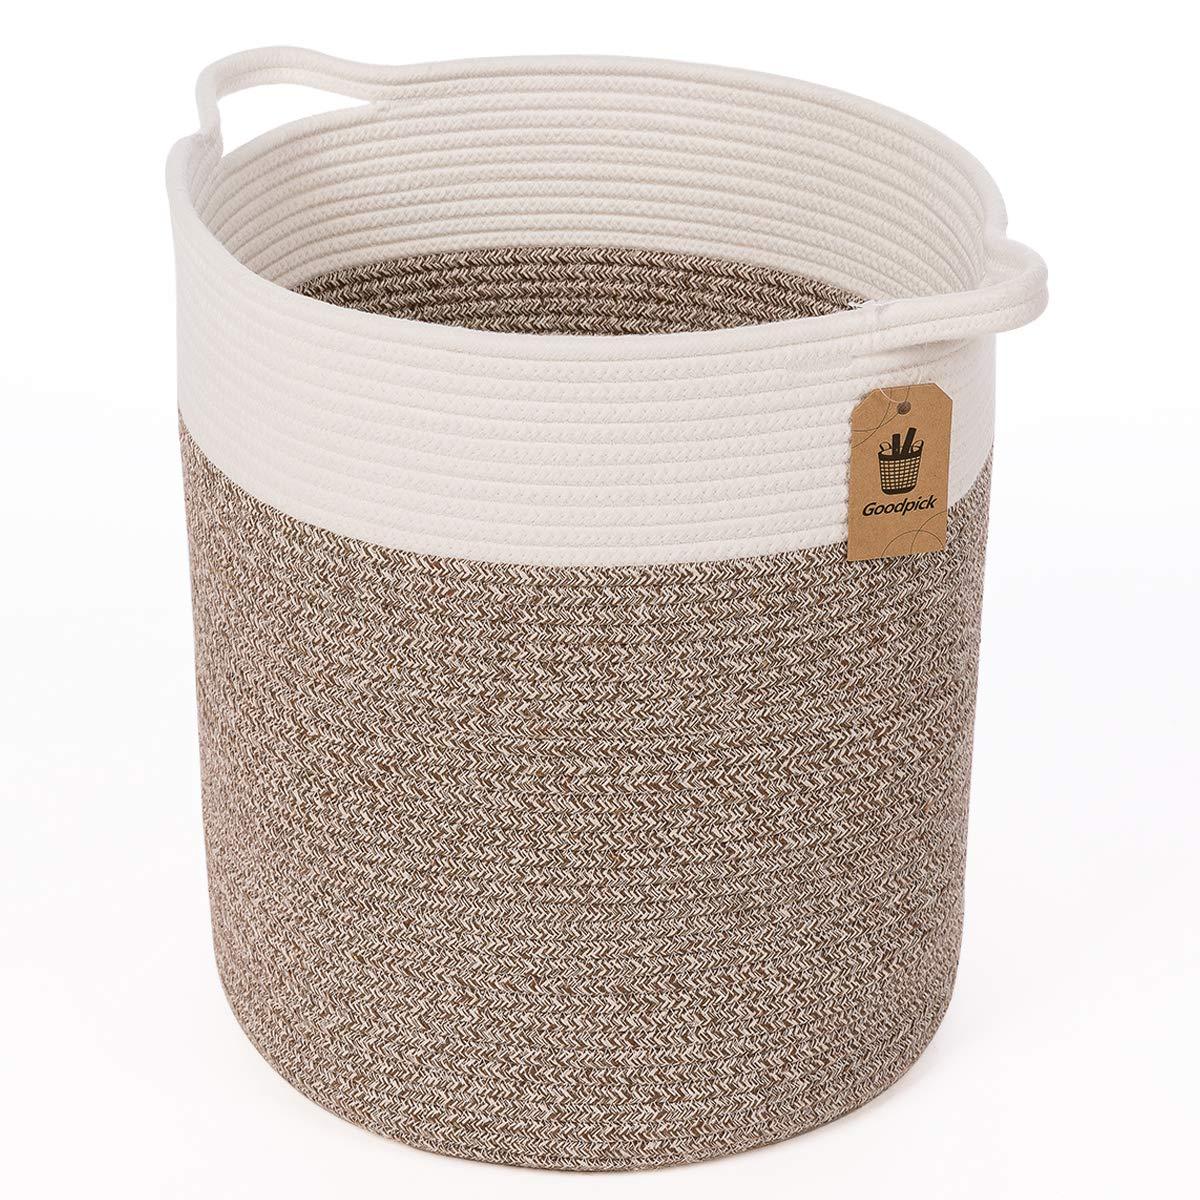 Goodpick Large Cotton Rope Basket Woven Basket Baby Laundry Basket Blanket Basket Toy Storage Bin for Living Room Floor Nursery Decor 15x13 rack08-small meleGoodpick